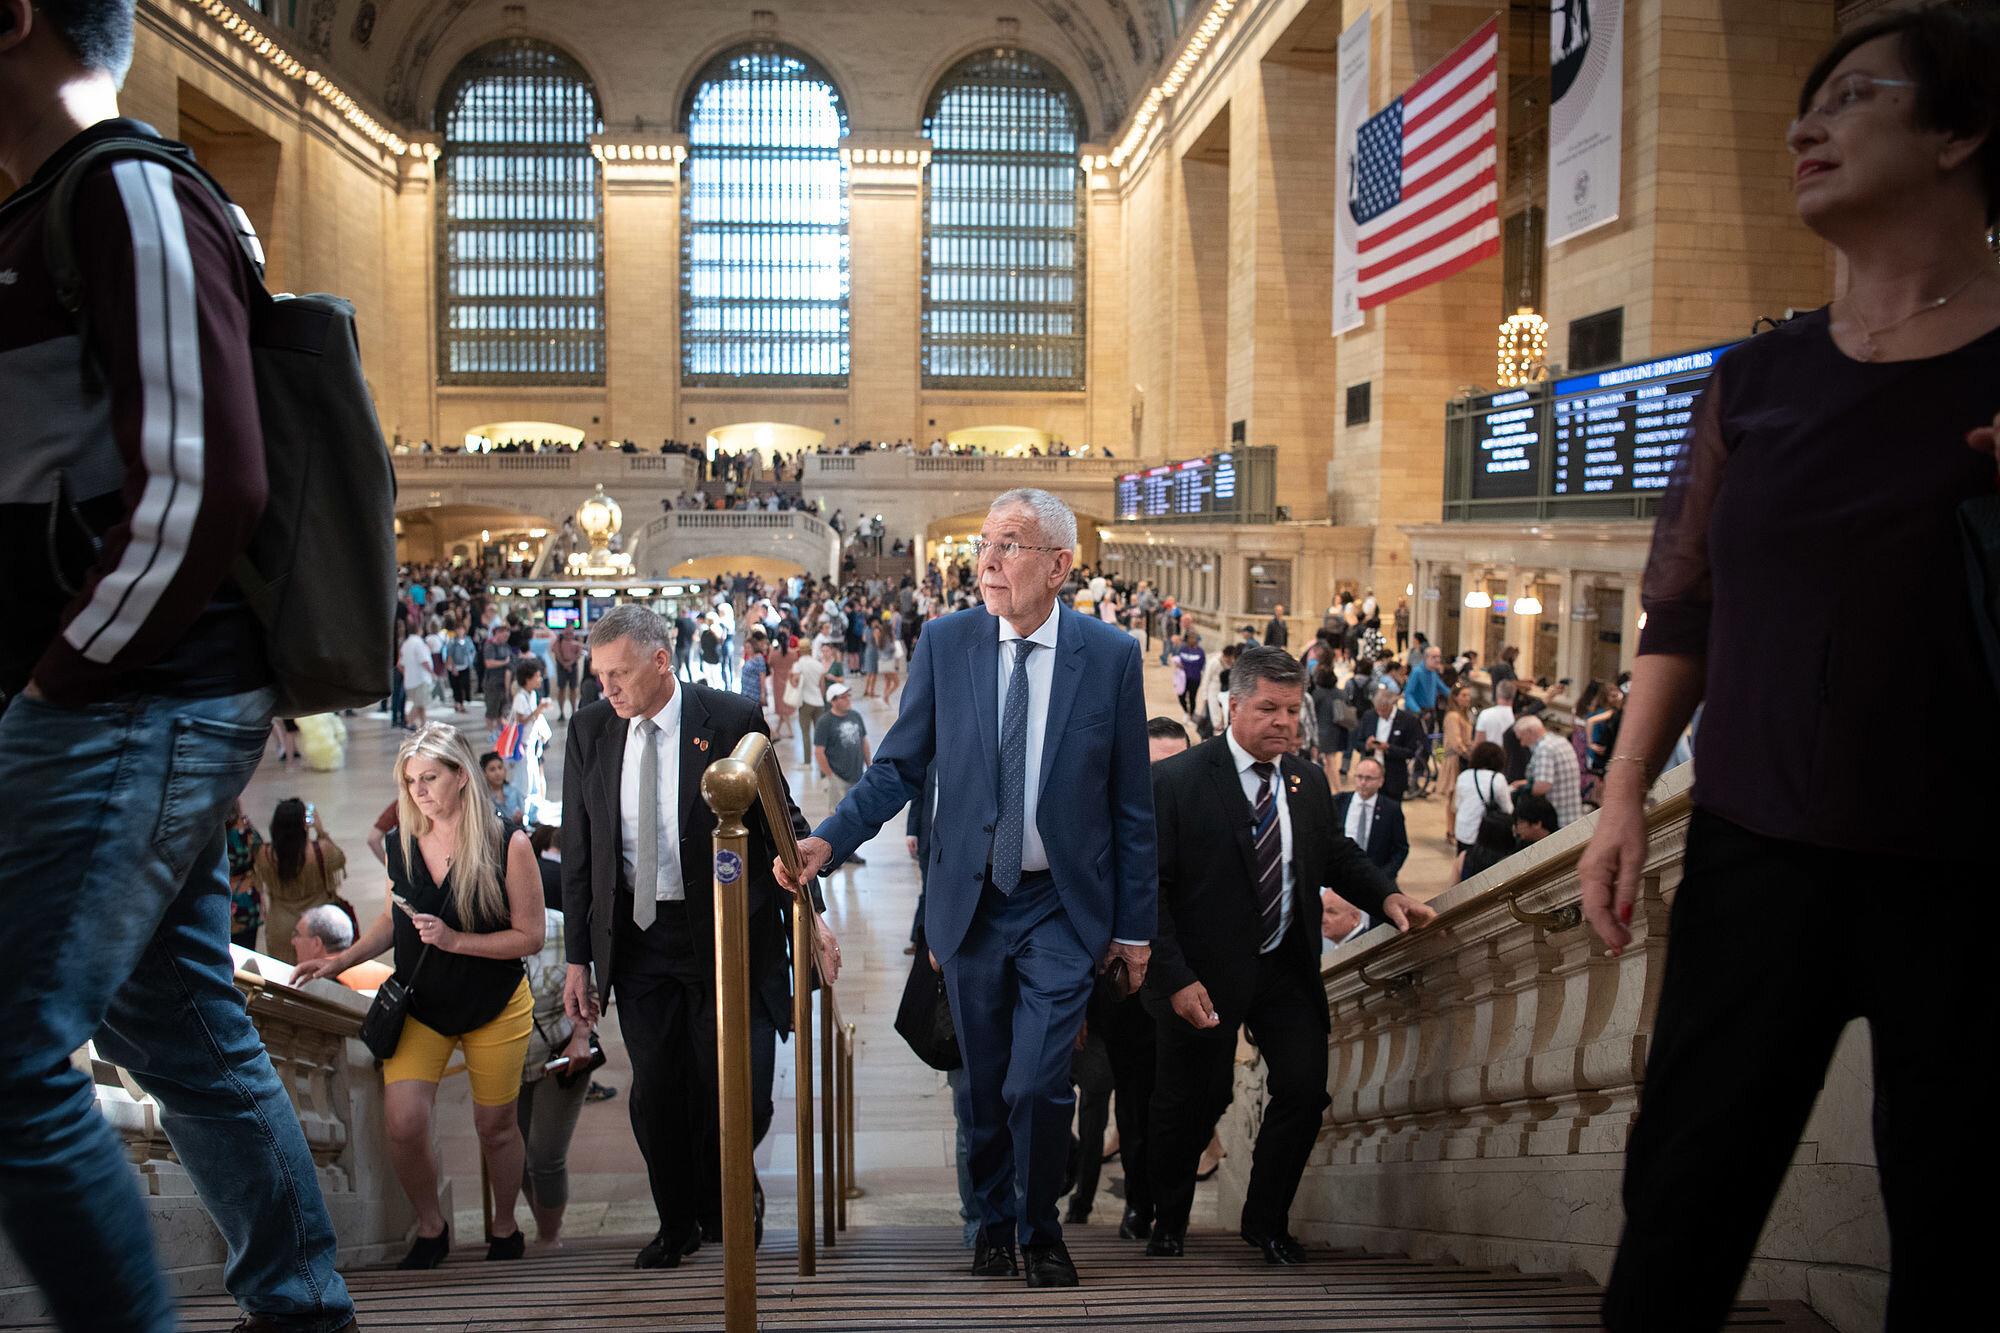 Federal President Alexander Van der Bellen at Grand Central Station in New York City.   Photo: Carina Karlovits/HBF